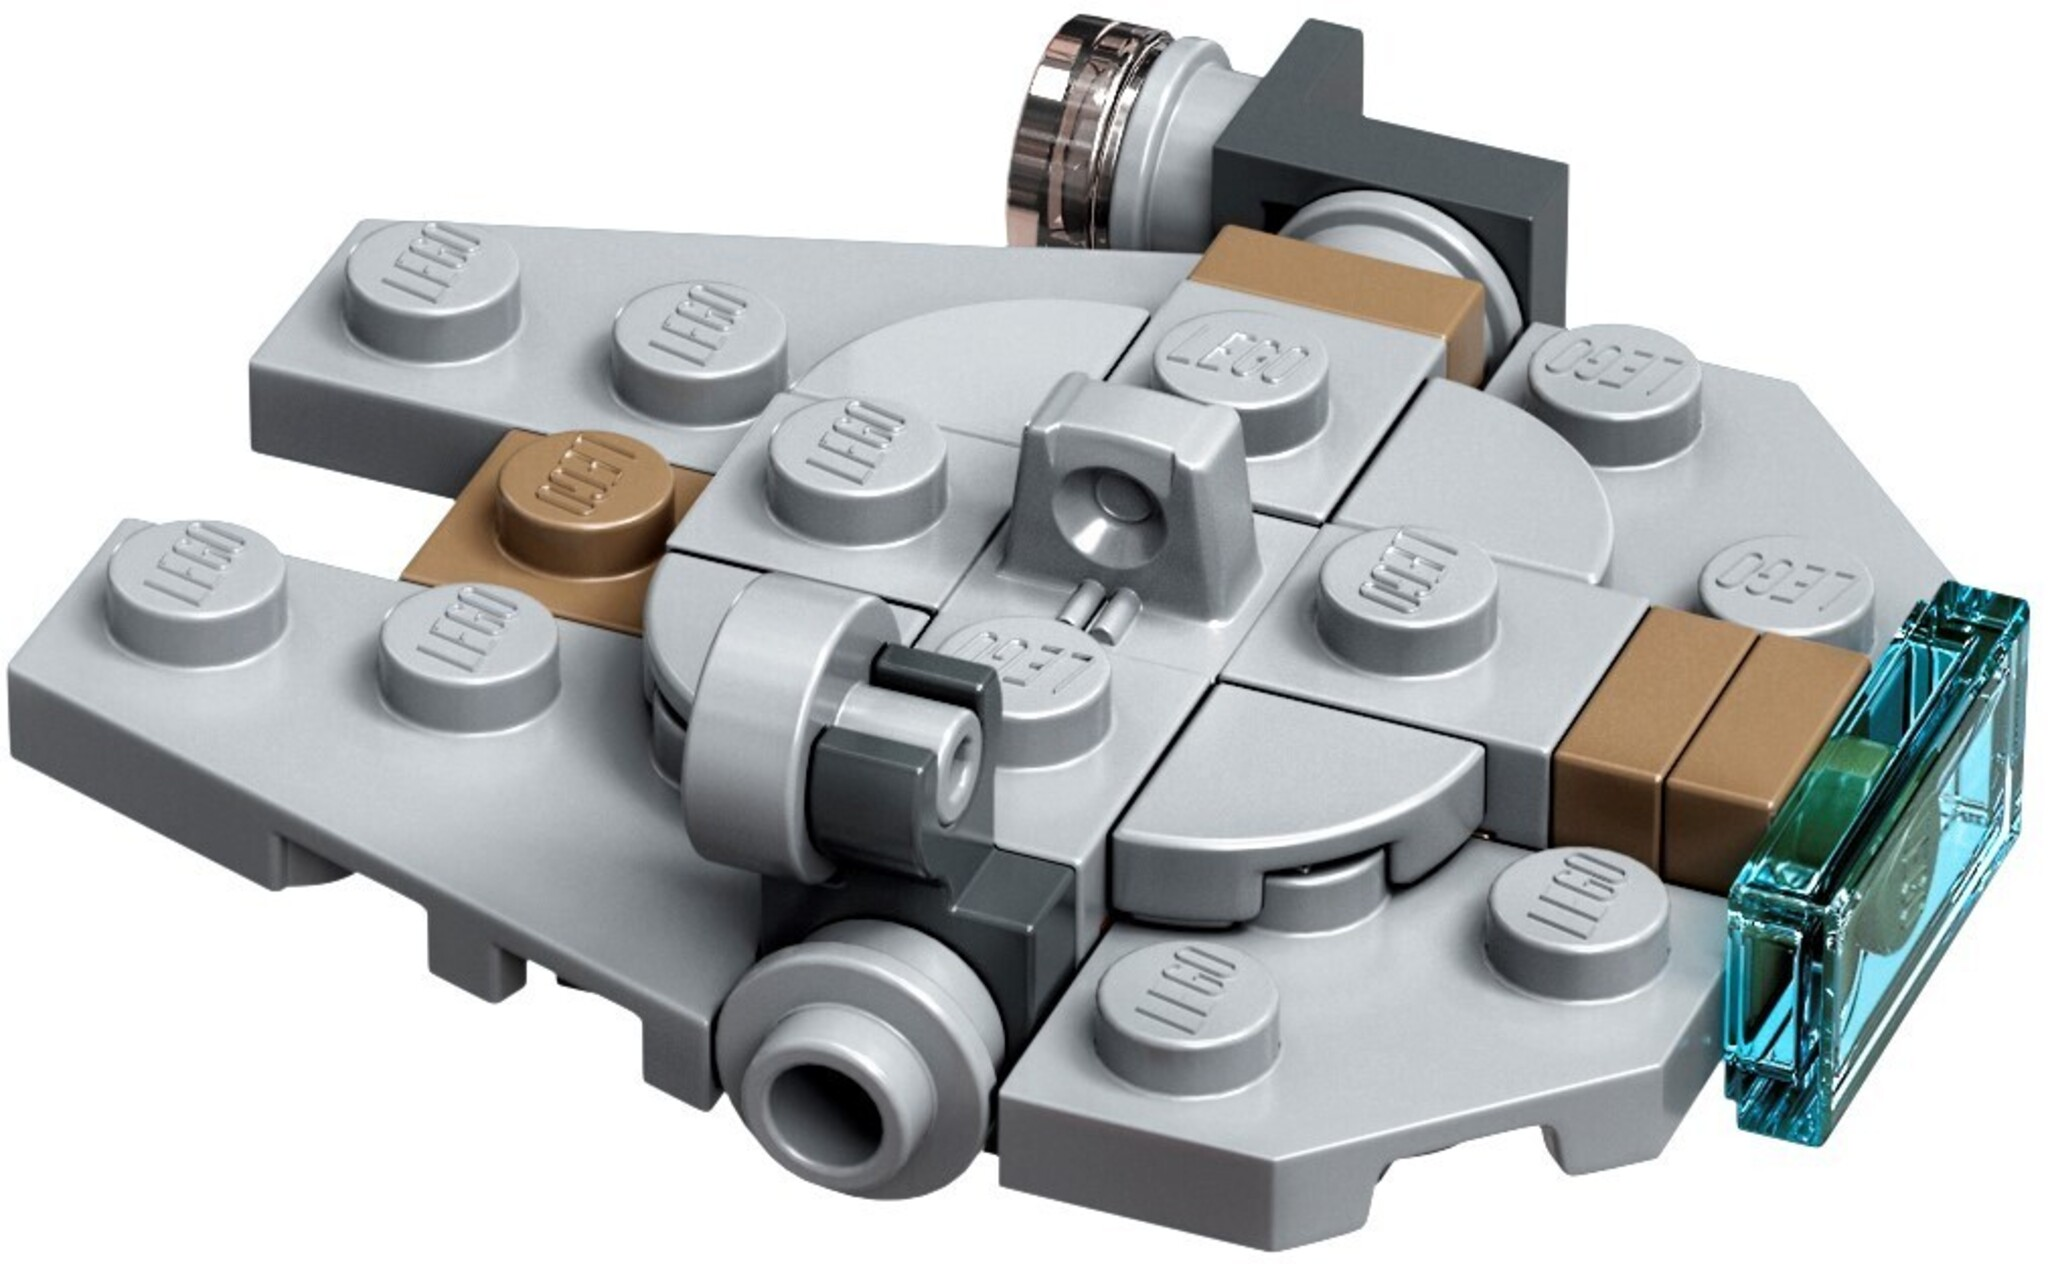 LEGO Star Wars 75279 - Calendario dell'Avvento LEGO Star ...